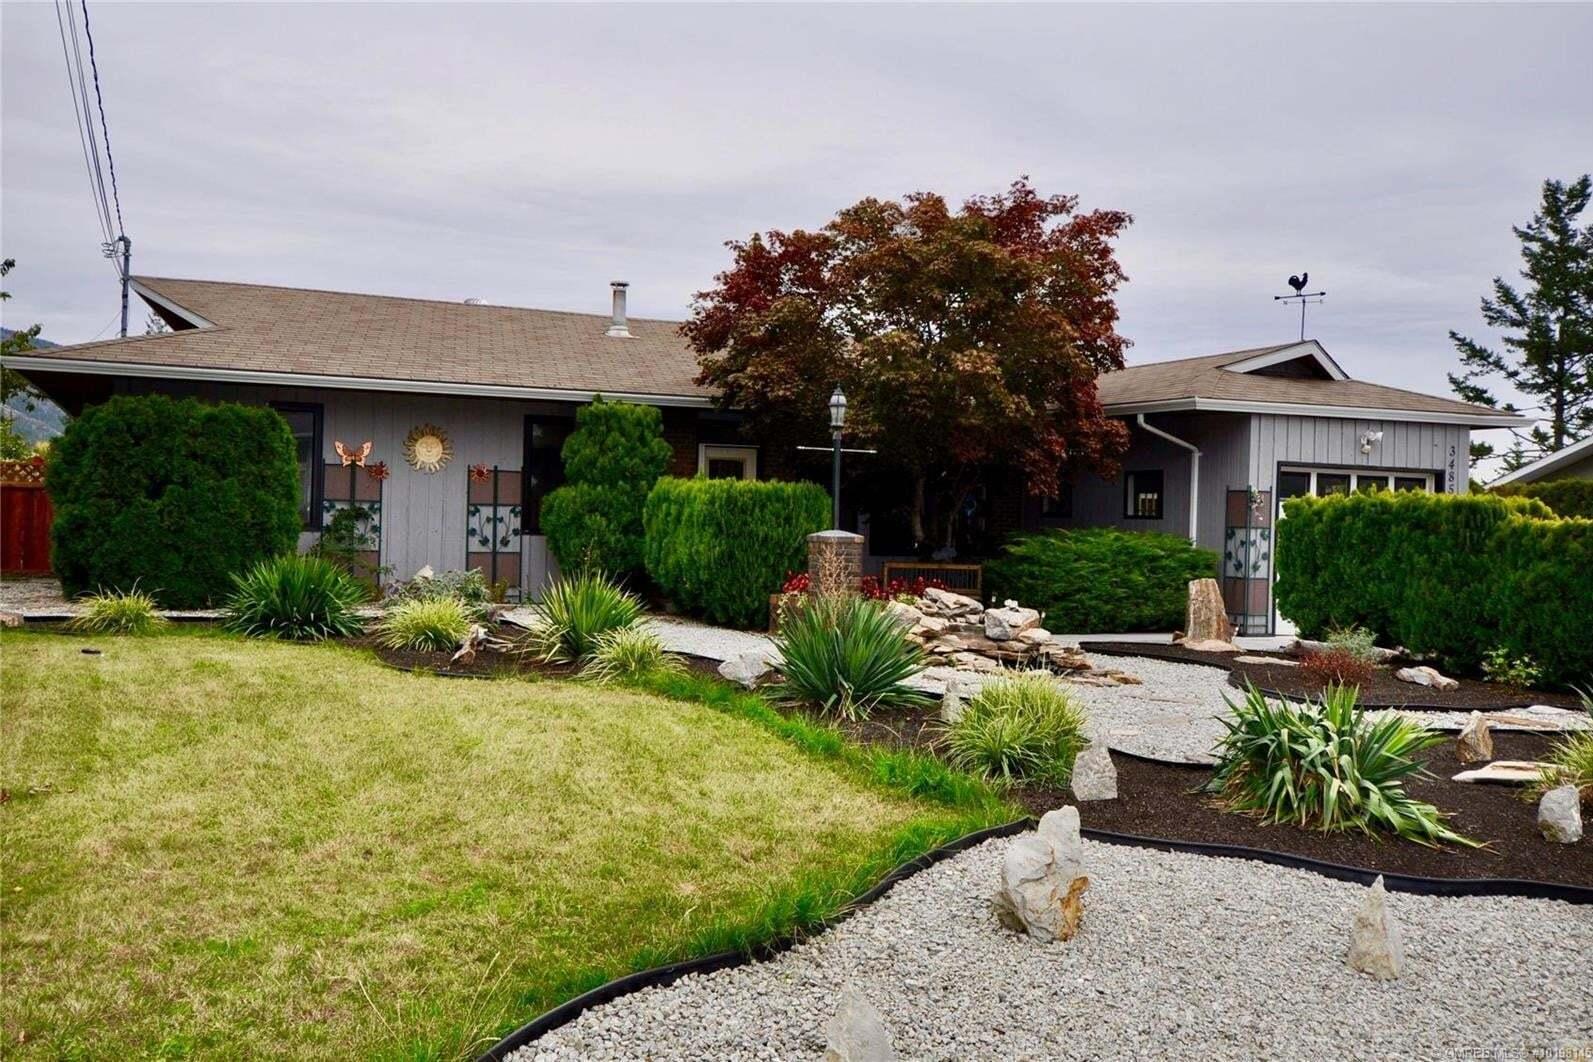 House for sale at 3485 Dunbarton Rd West Kelowna British Columbia - MLS: 10198145